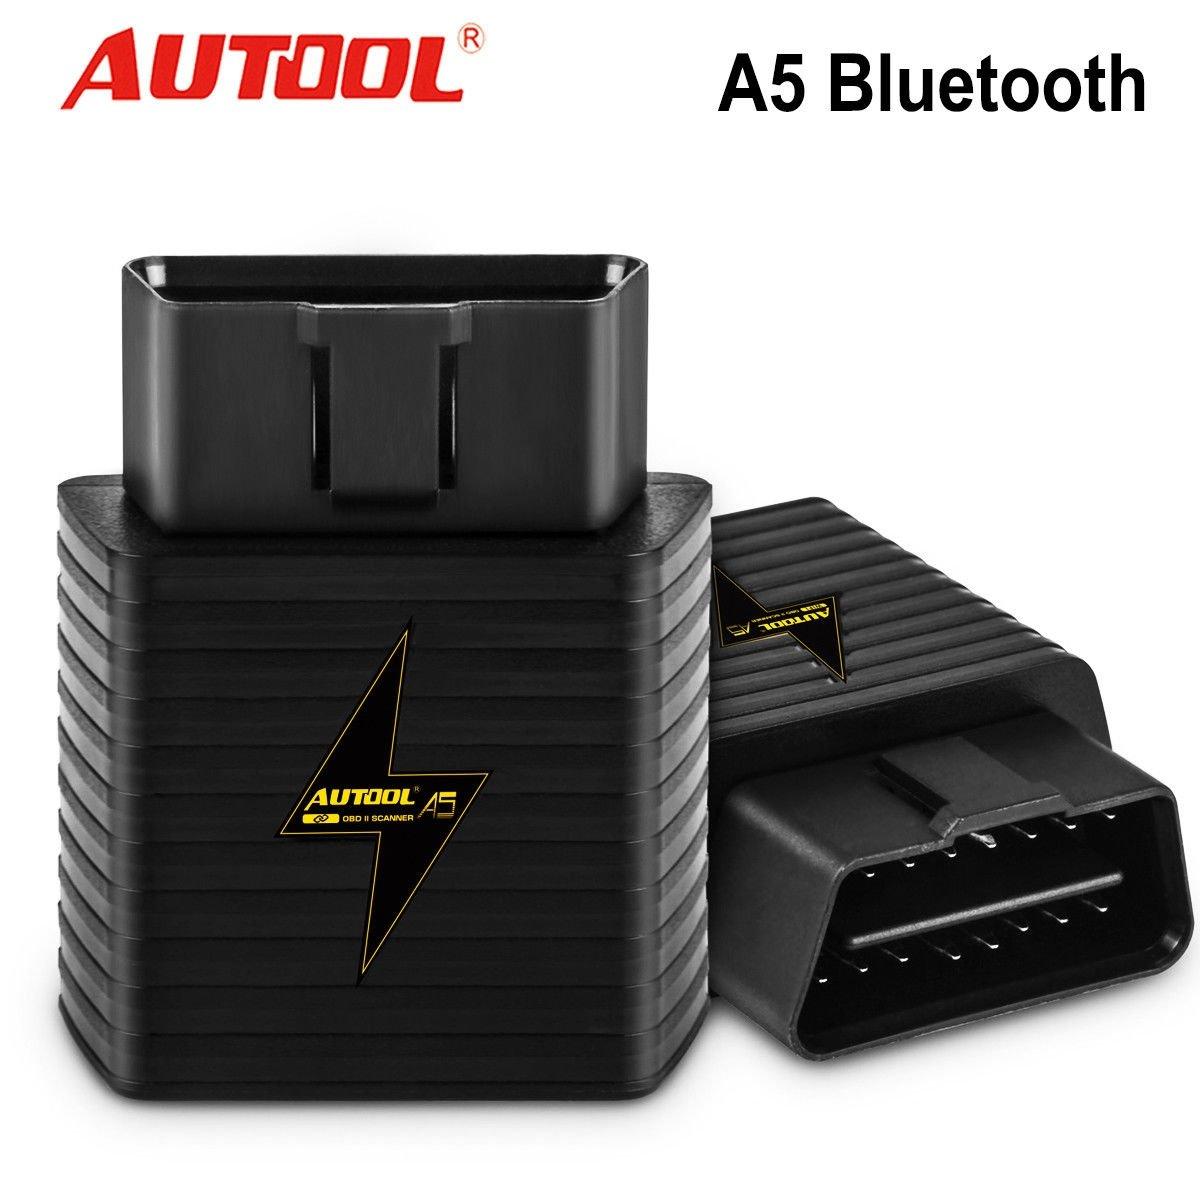 AUTOOL WIFI / Bluetooth скенер